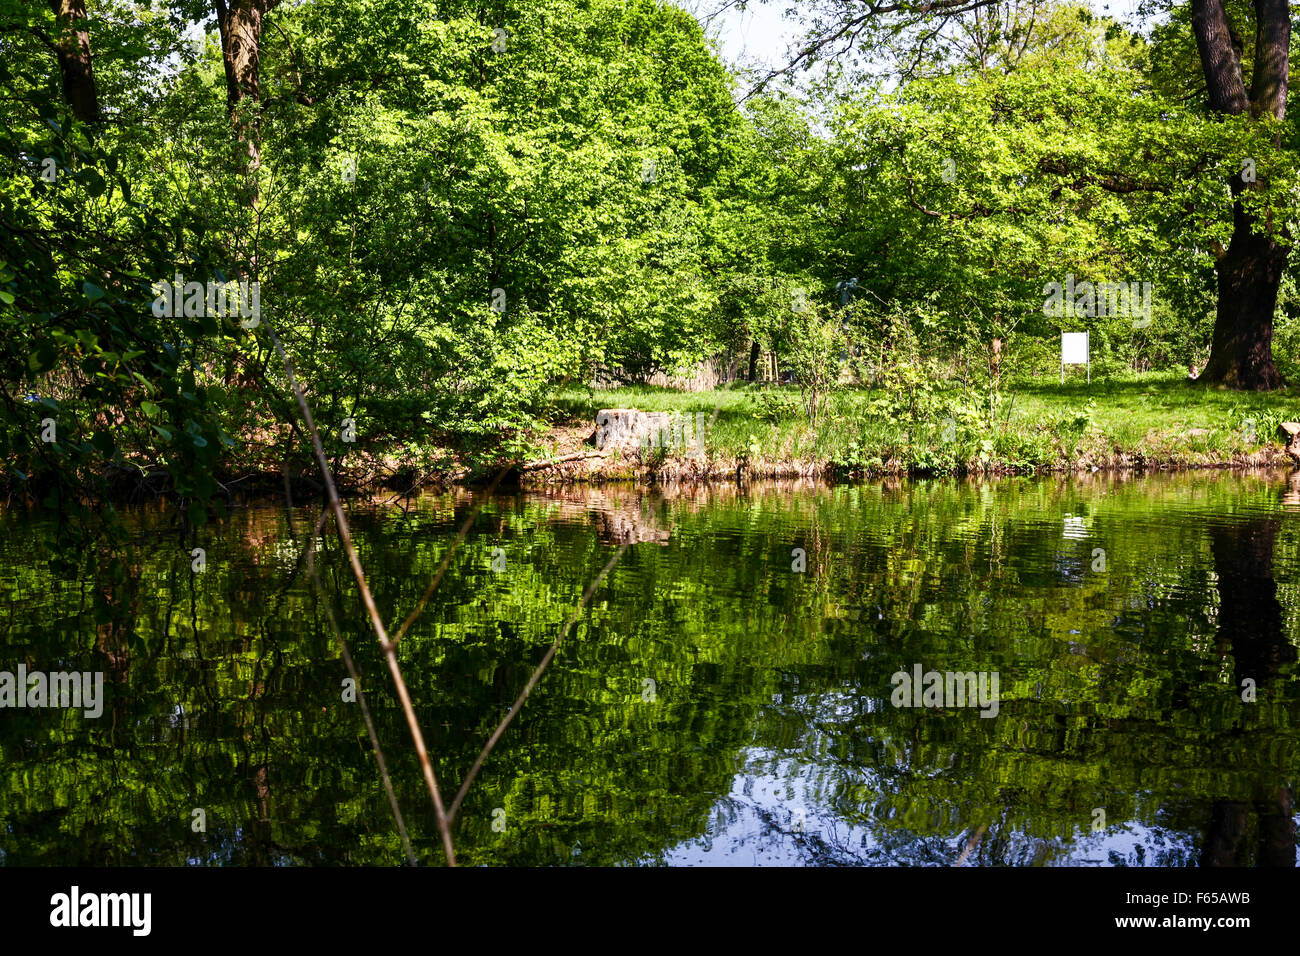 Trees around a water pond Stock Photo